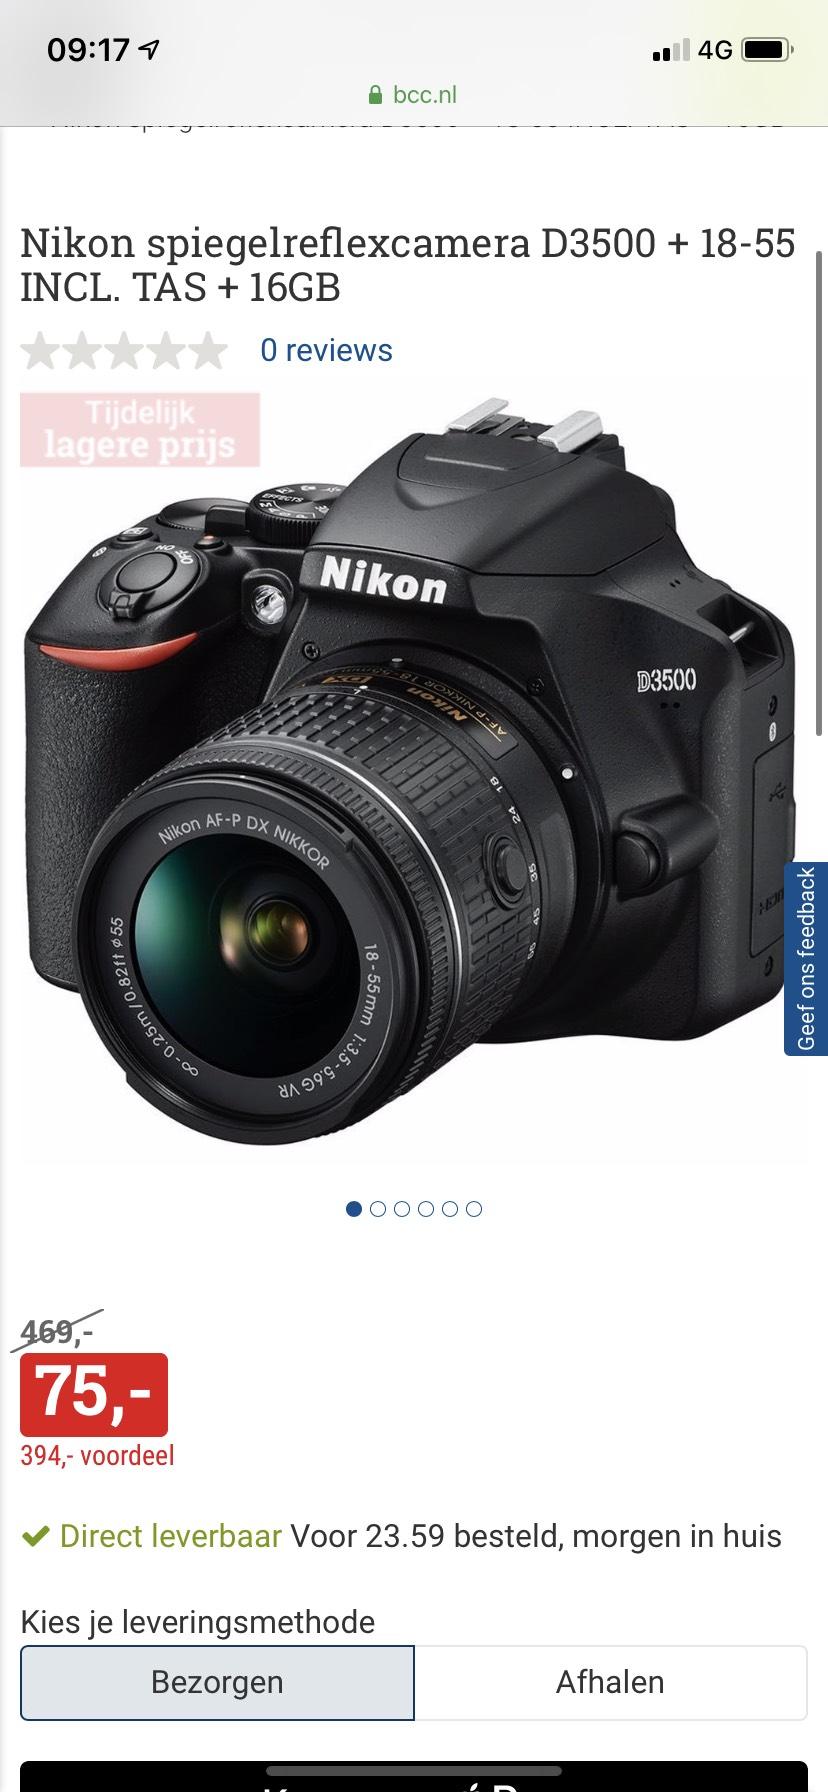 Nikon D3500 + 18-55 INCL. TAS + 16GB